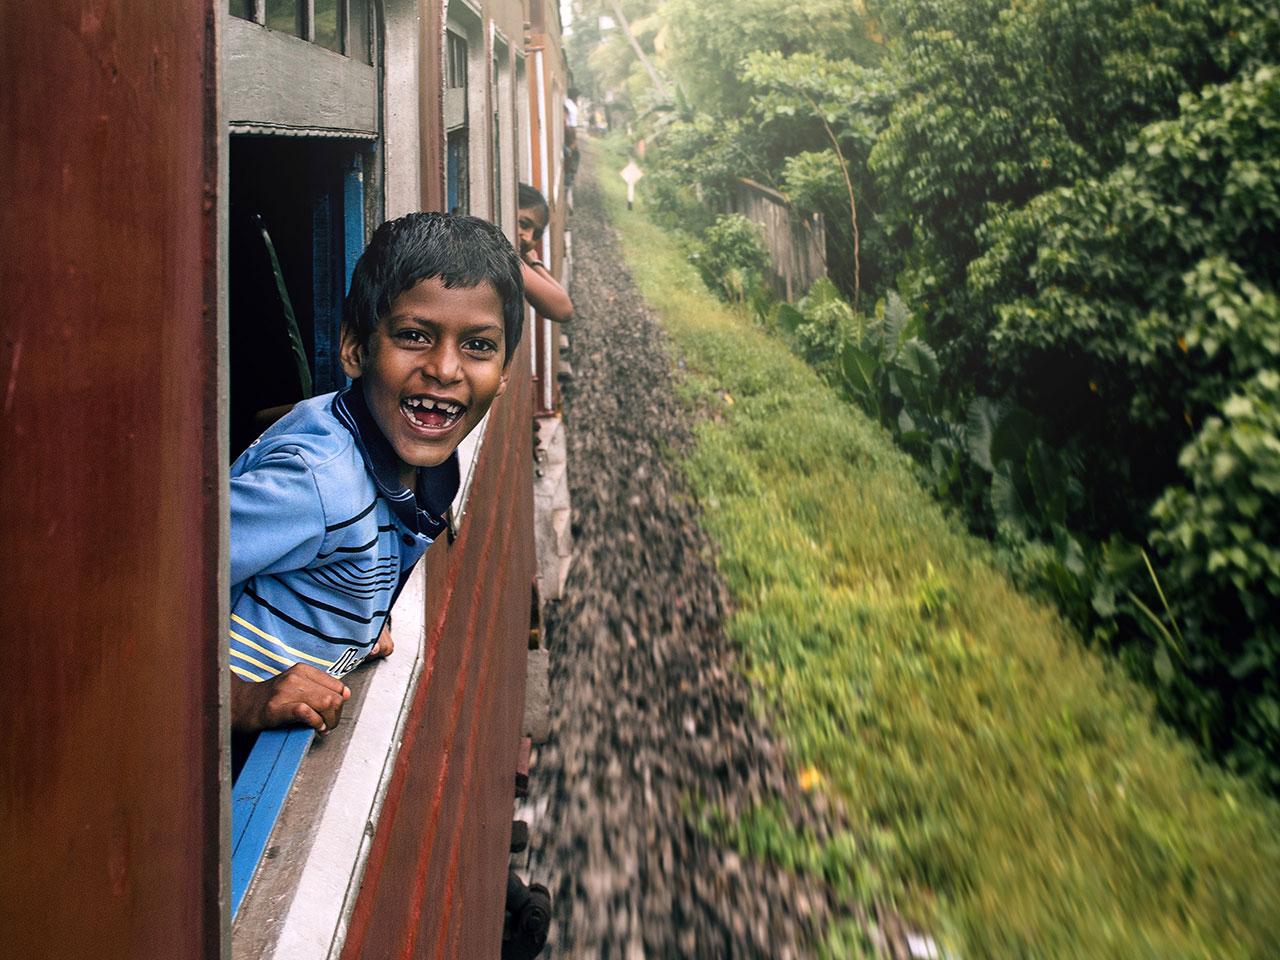 Sri Lanka Train Boy Portrait